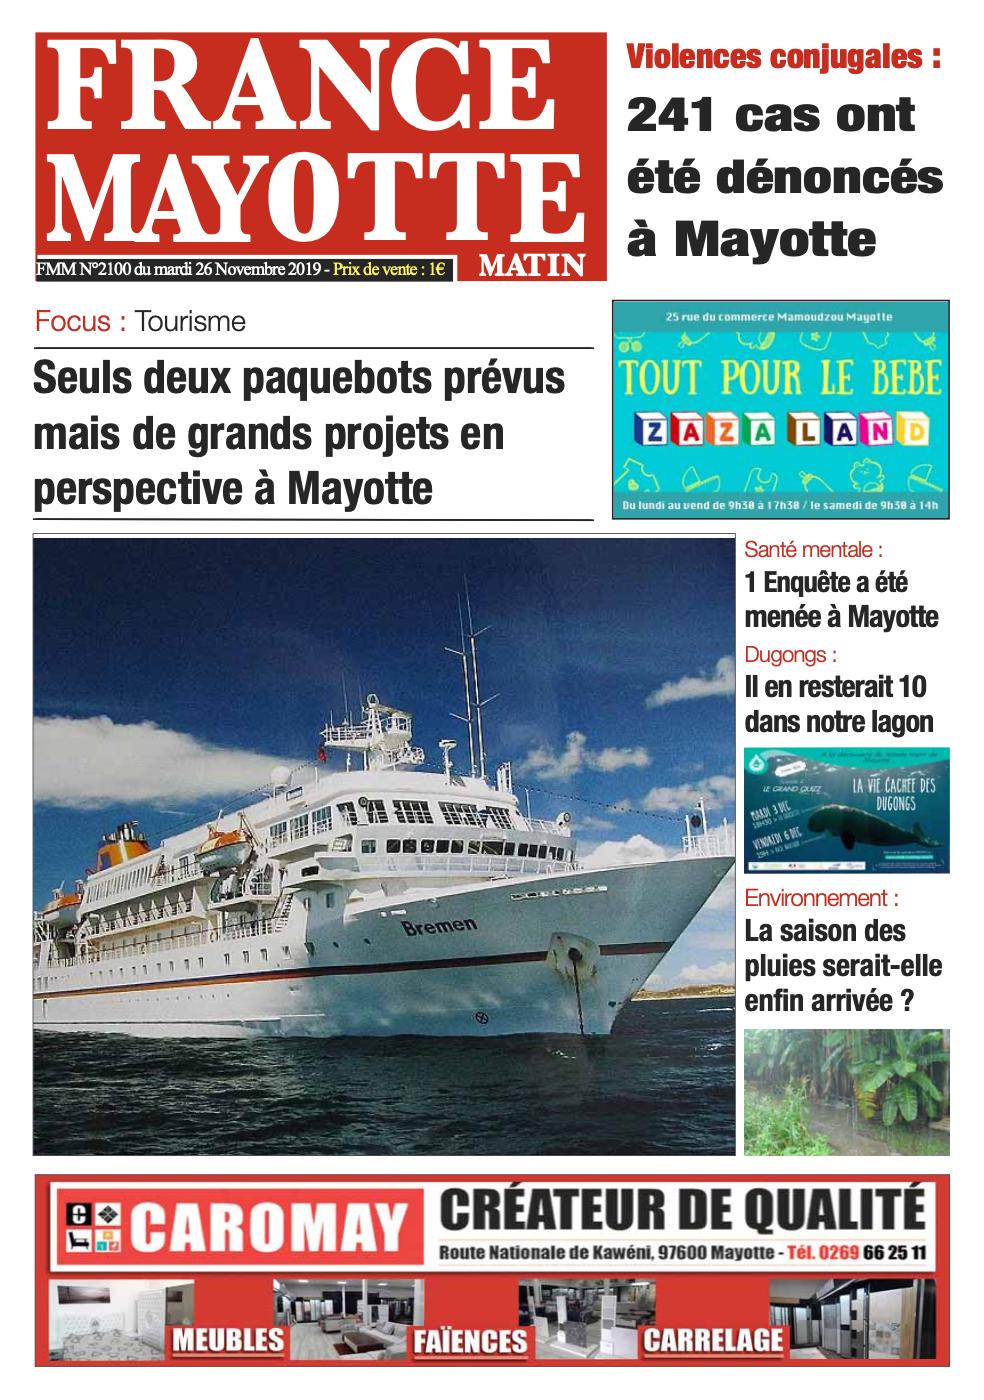 France Mayotte Mardi 26 novembre 2019